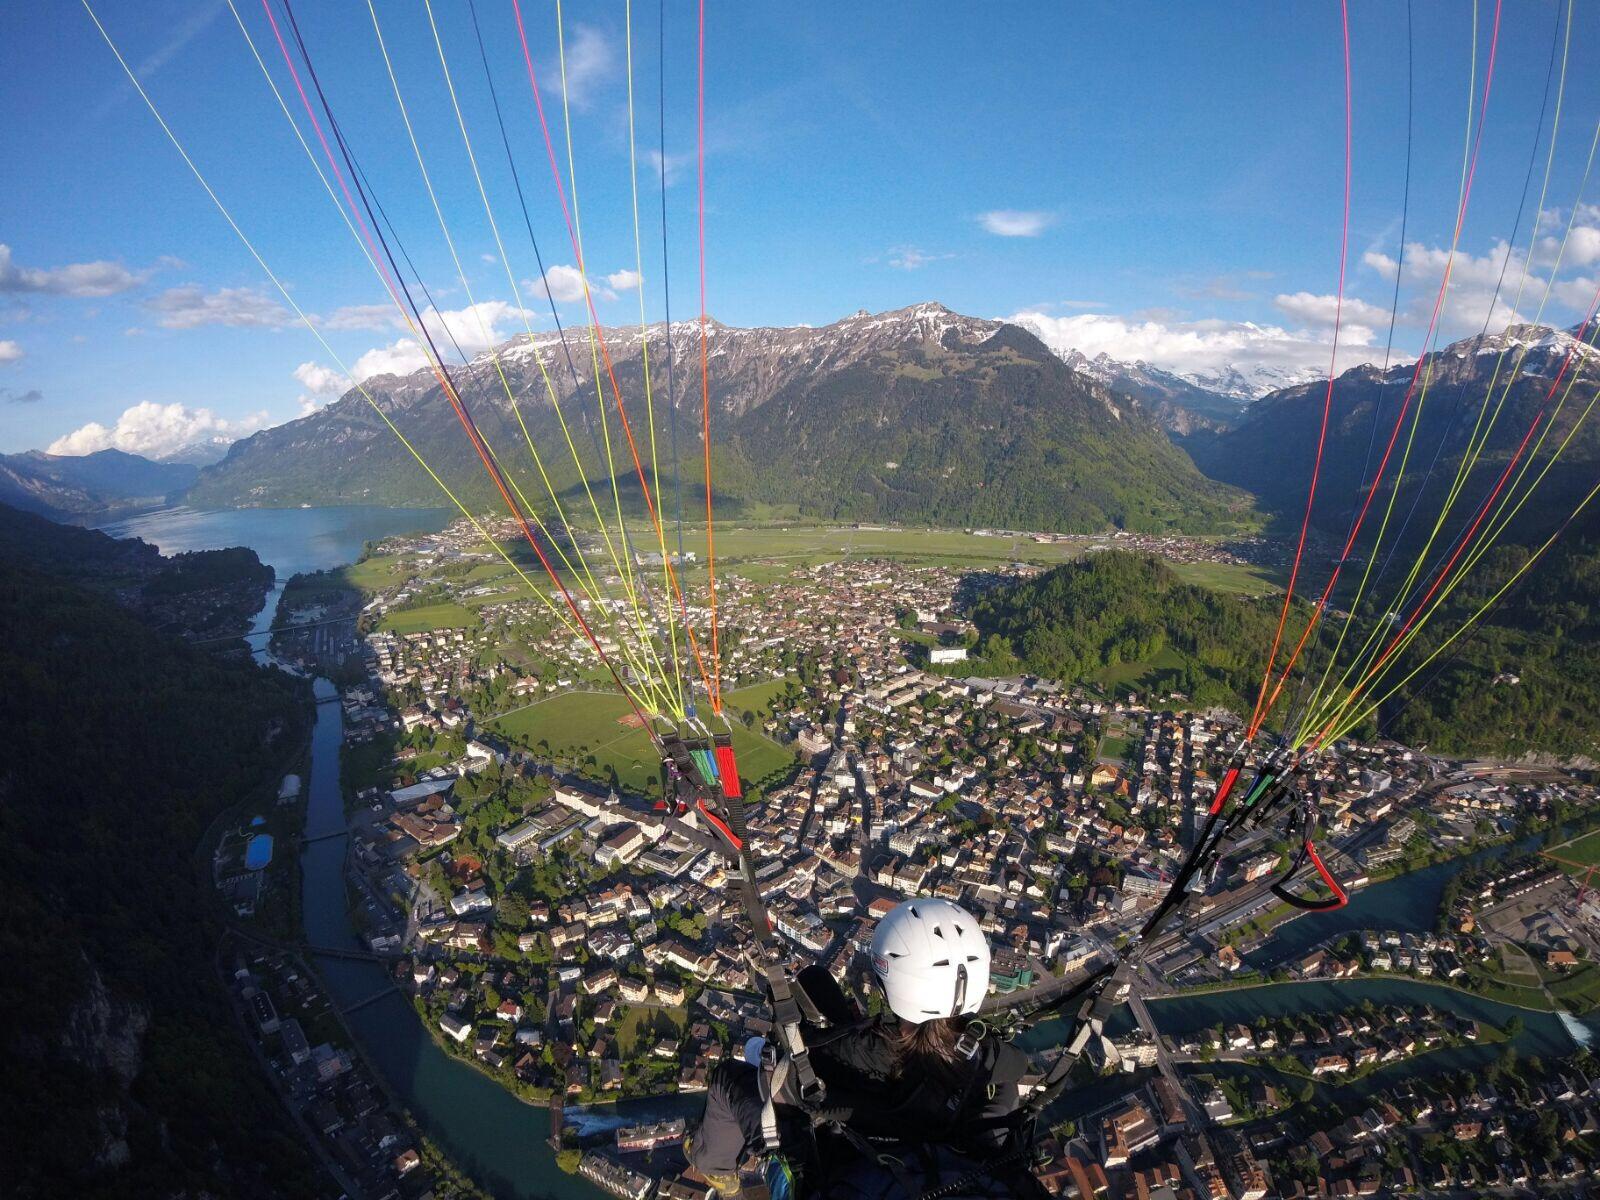 Paragliding above Interlaken